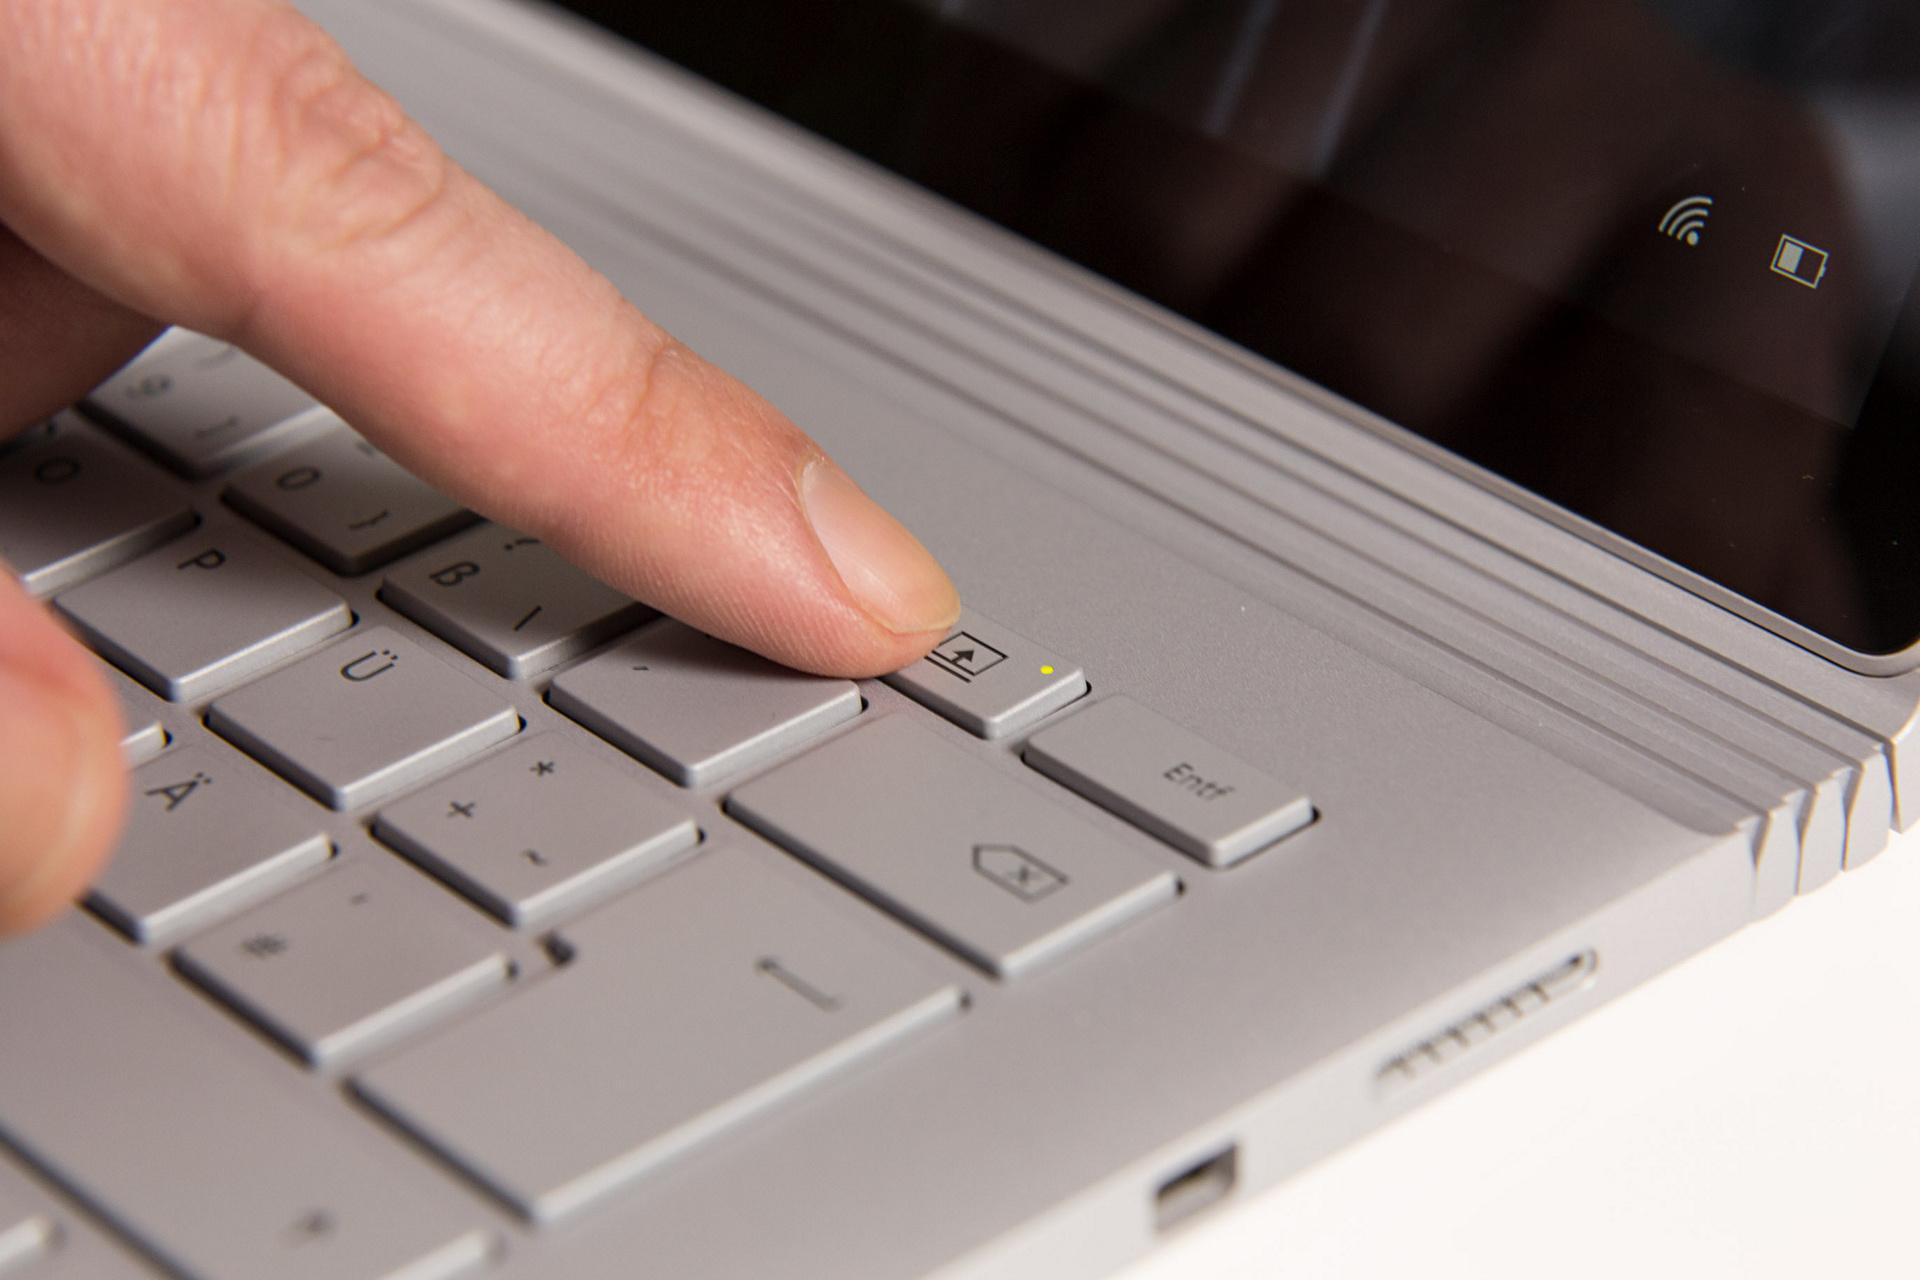 Surface Book im Test: Schon fast der ultimative Laptop - Surface Book (Foto: Martin Wolf/Golem.de)